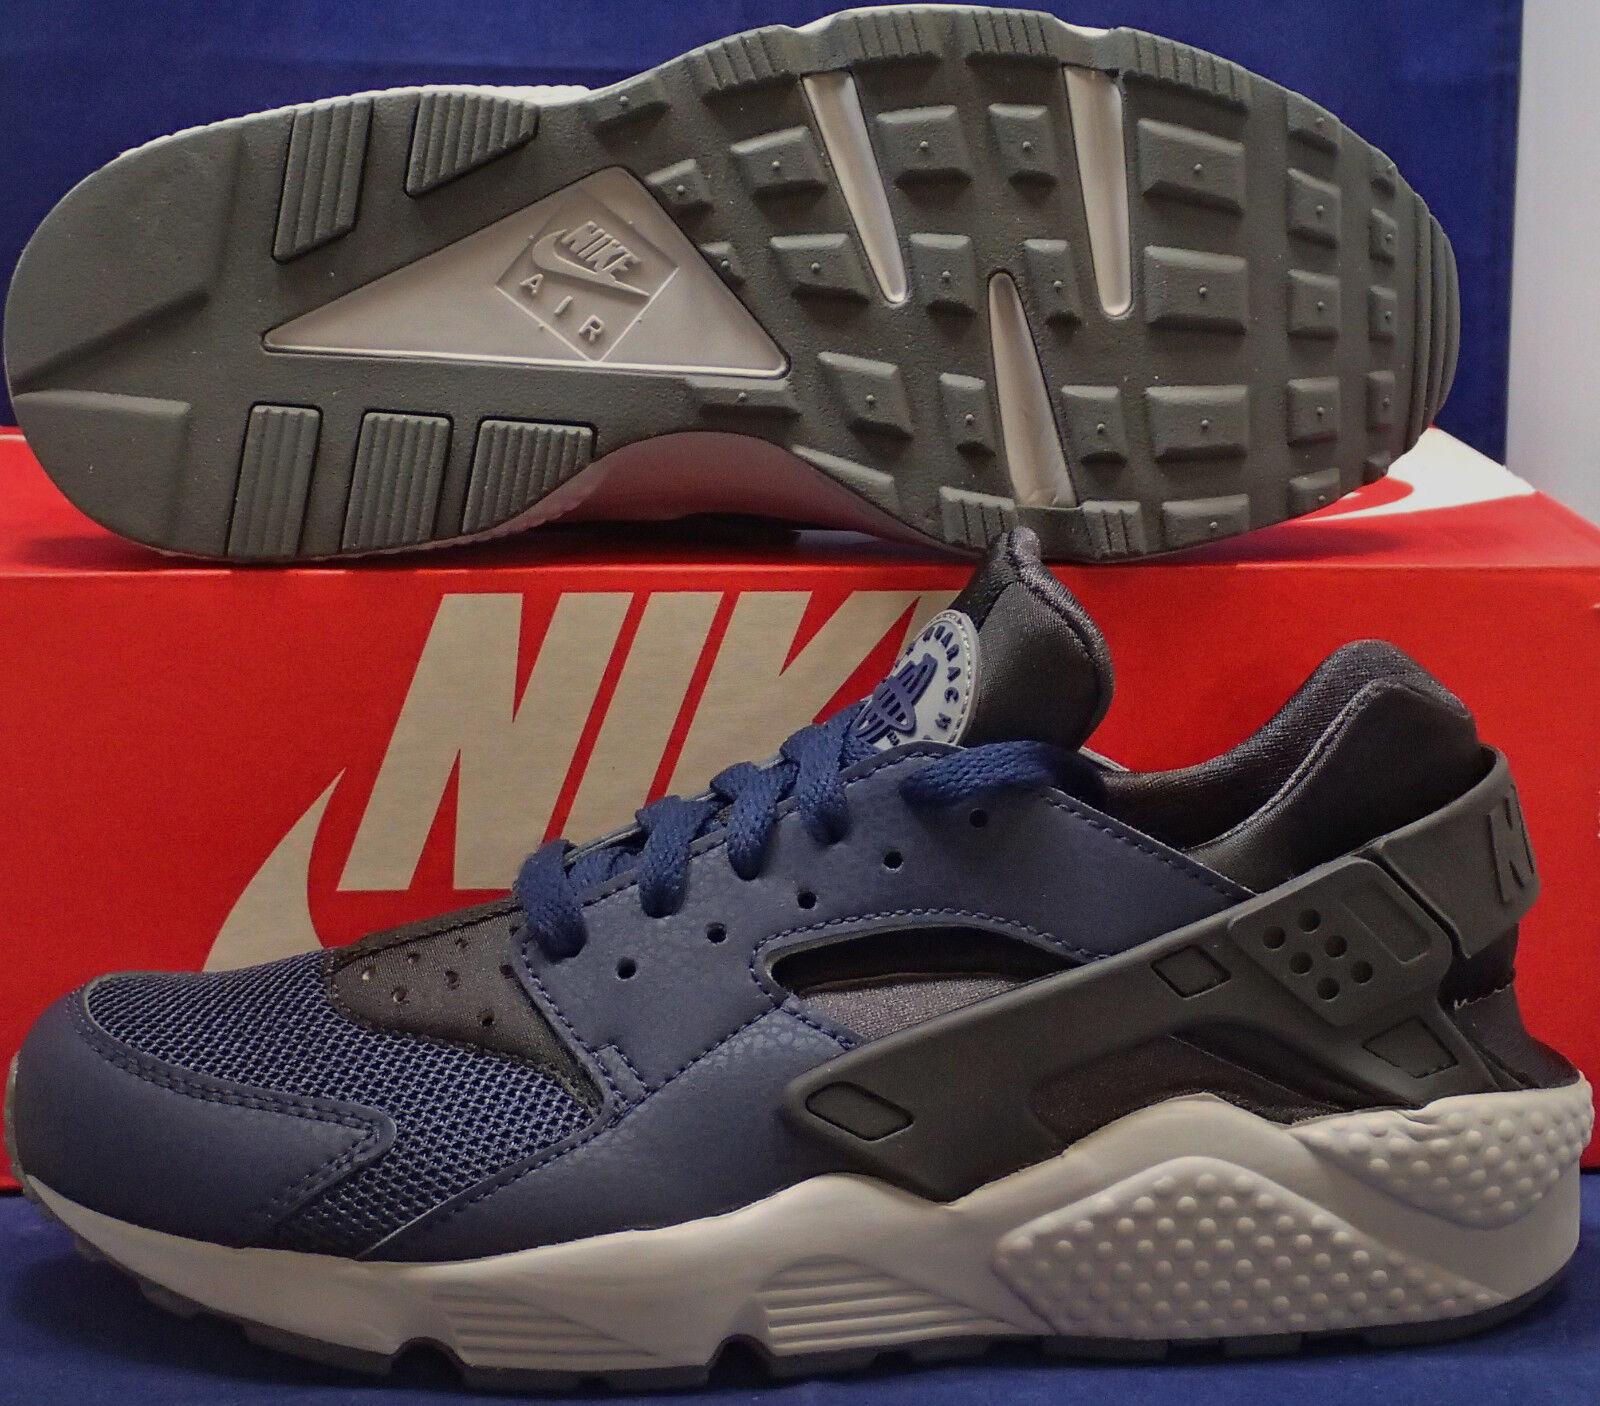 Nike Air Huarache Run Midnight Navy Dark Ash Cool Grey SZ 8.5 ( 318429-409 )